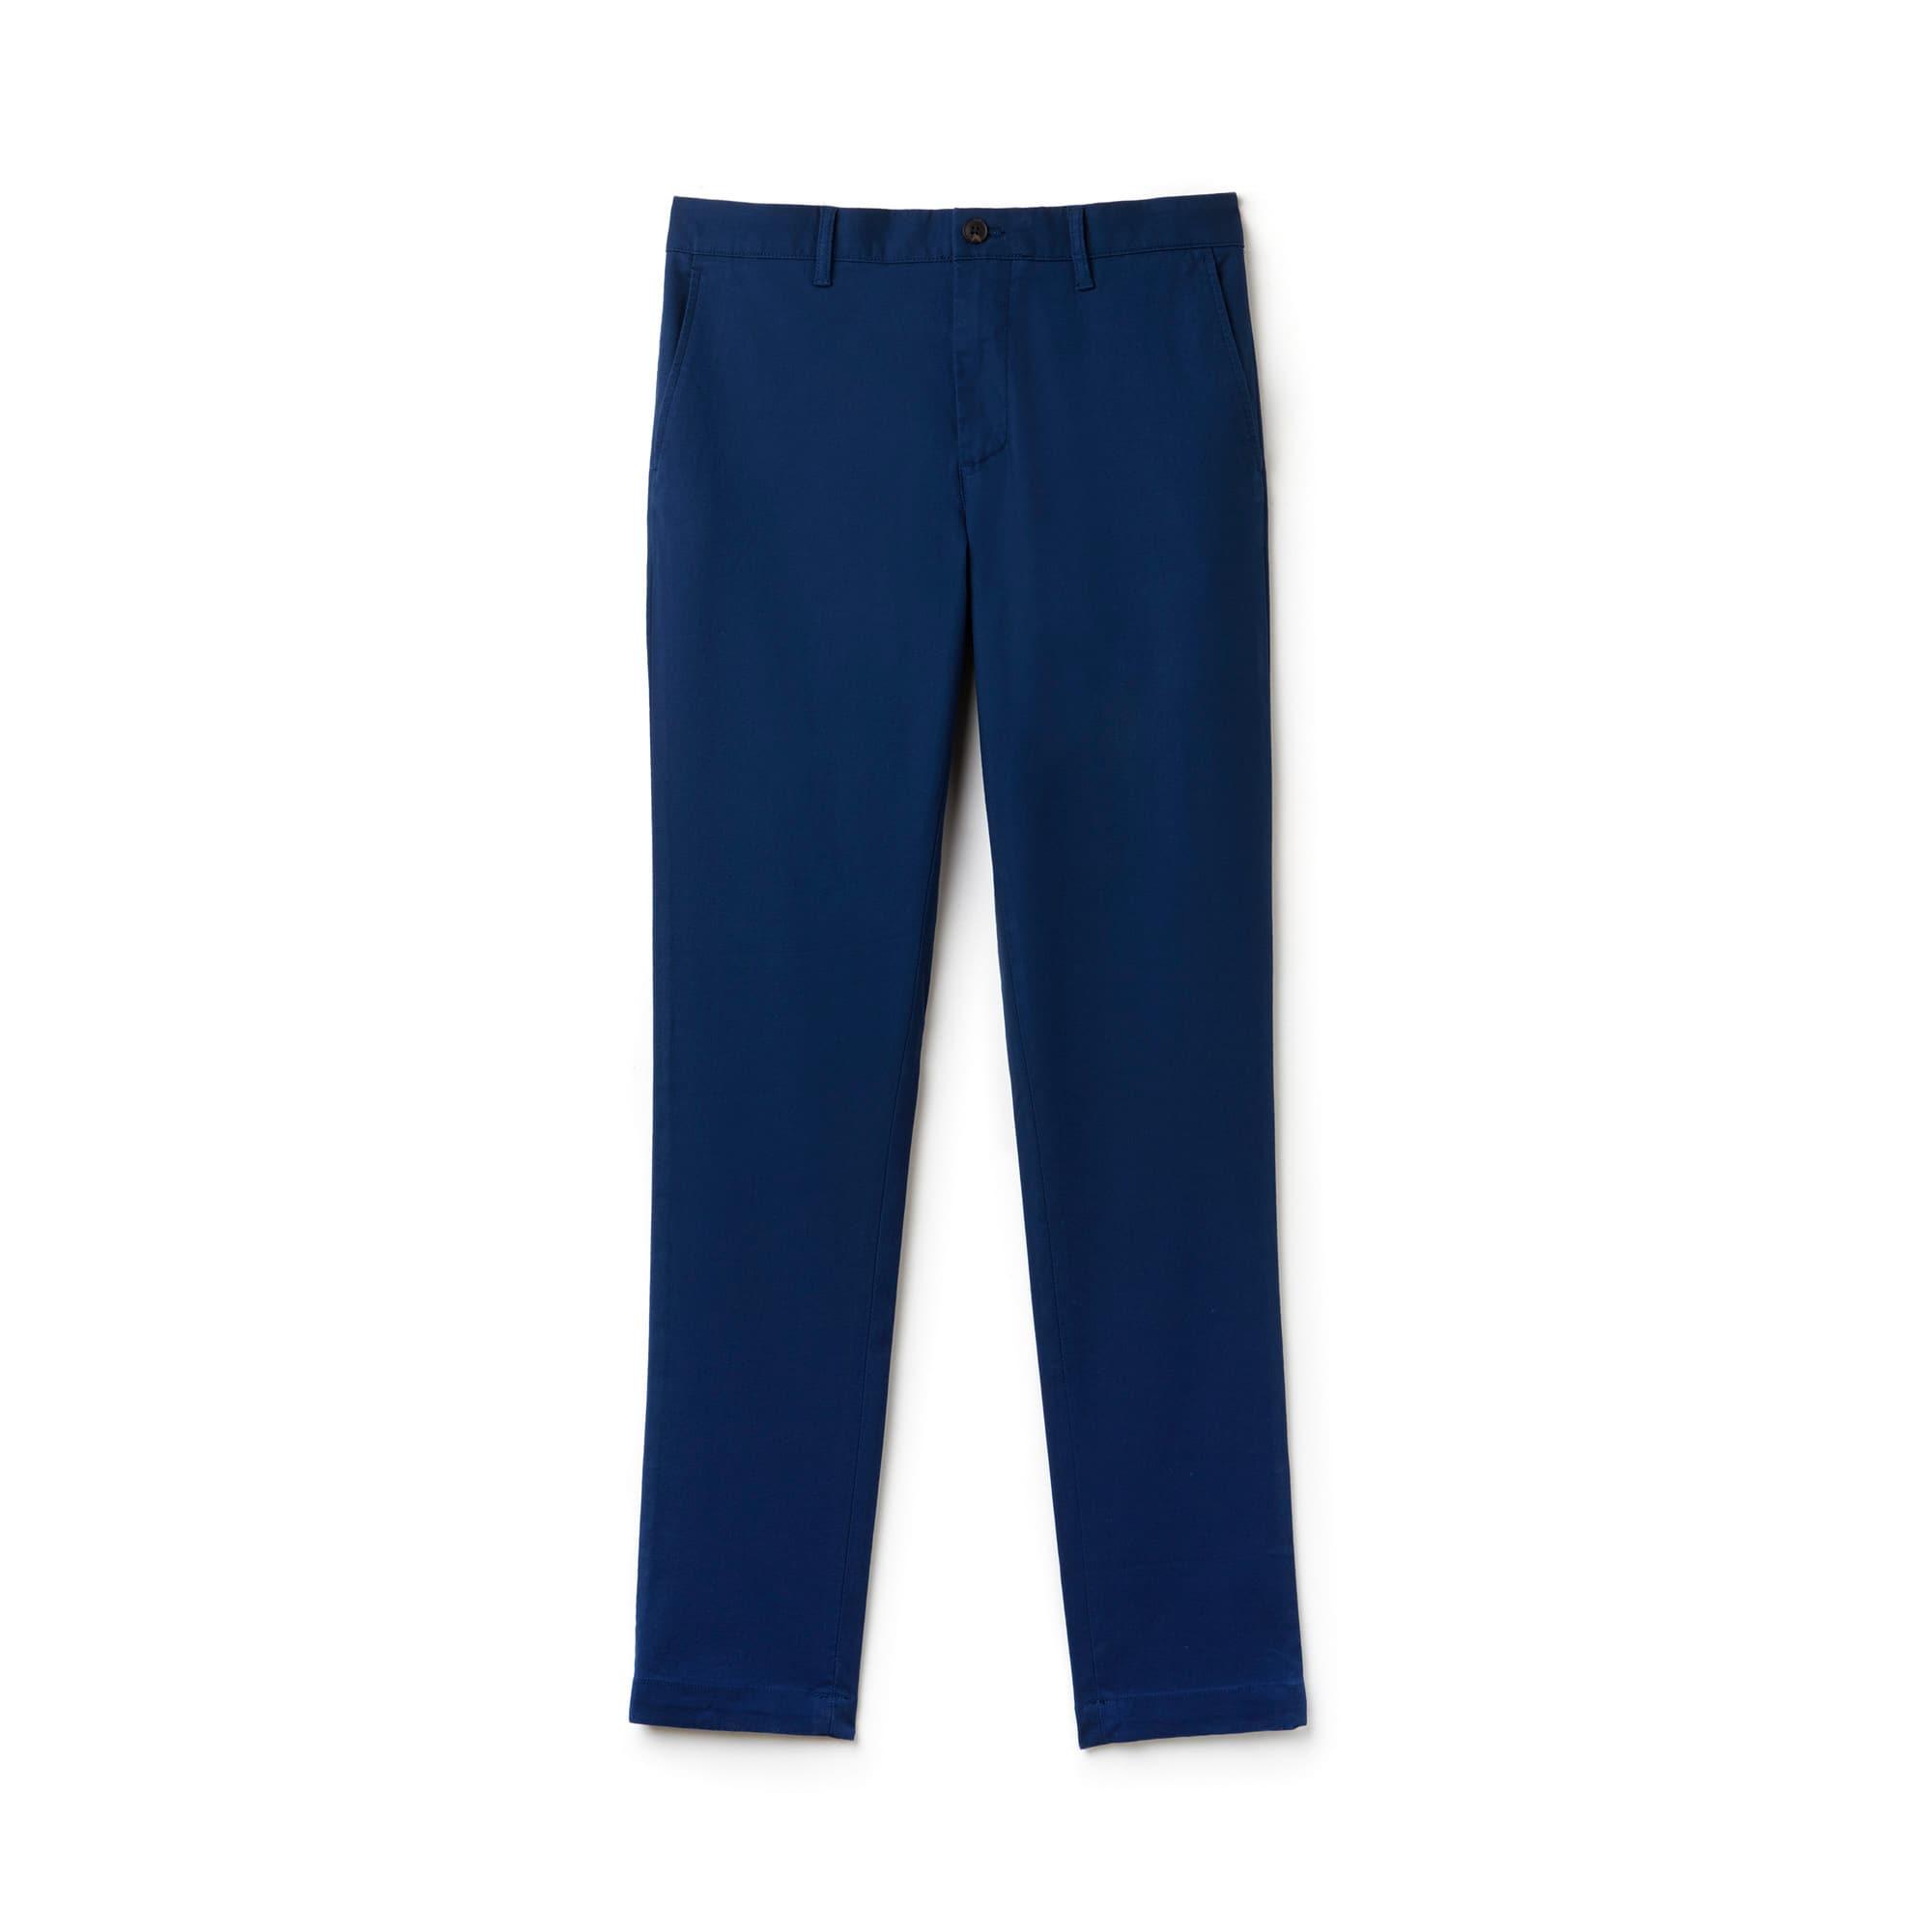 Men's Slim Fit Stretch Cotton Piqué Chino Pants